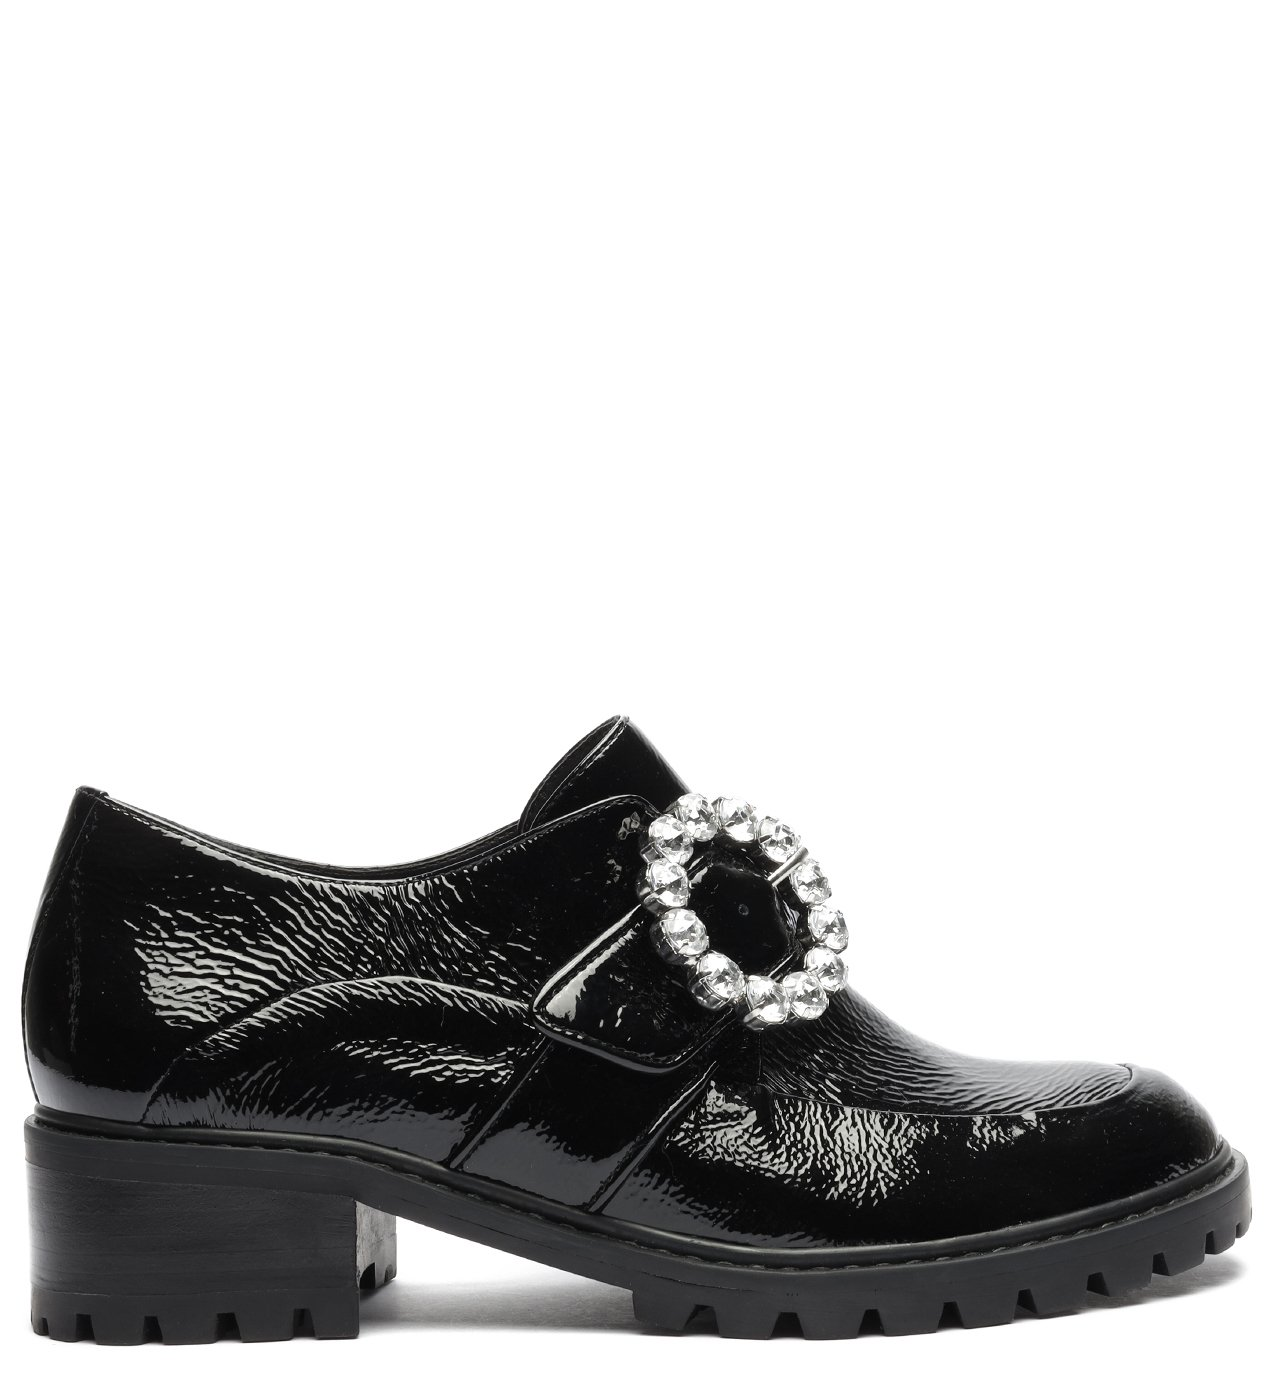 Sapato Oxford Tratorado Verniz Fivela Preto   Schutz